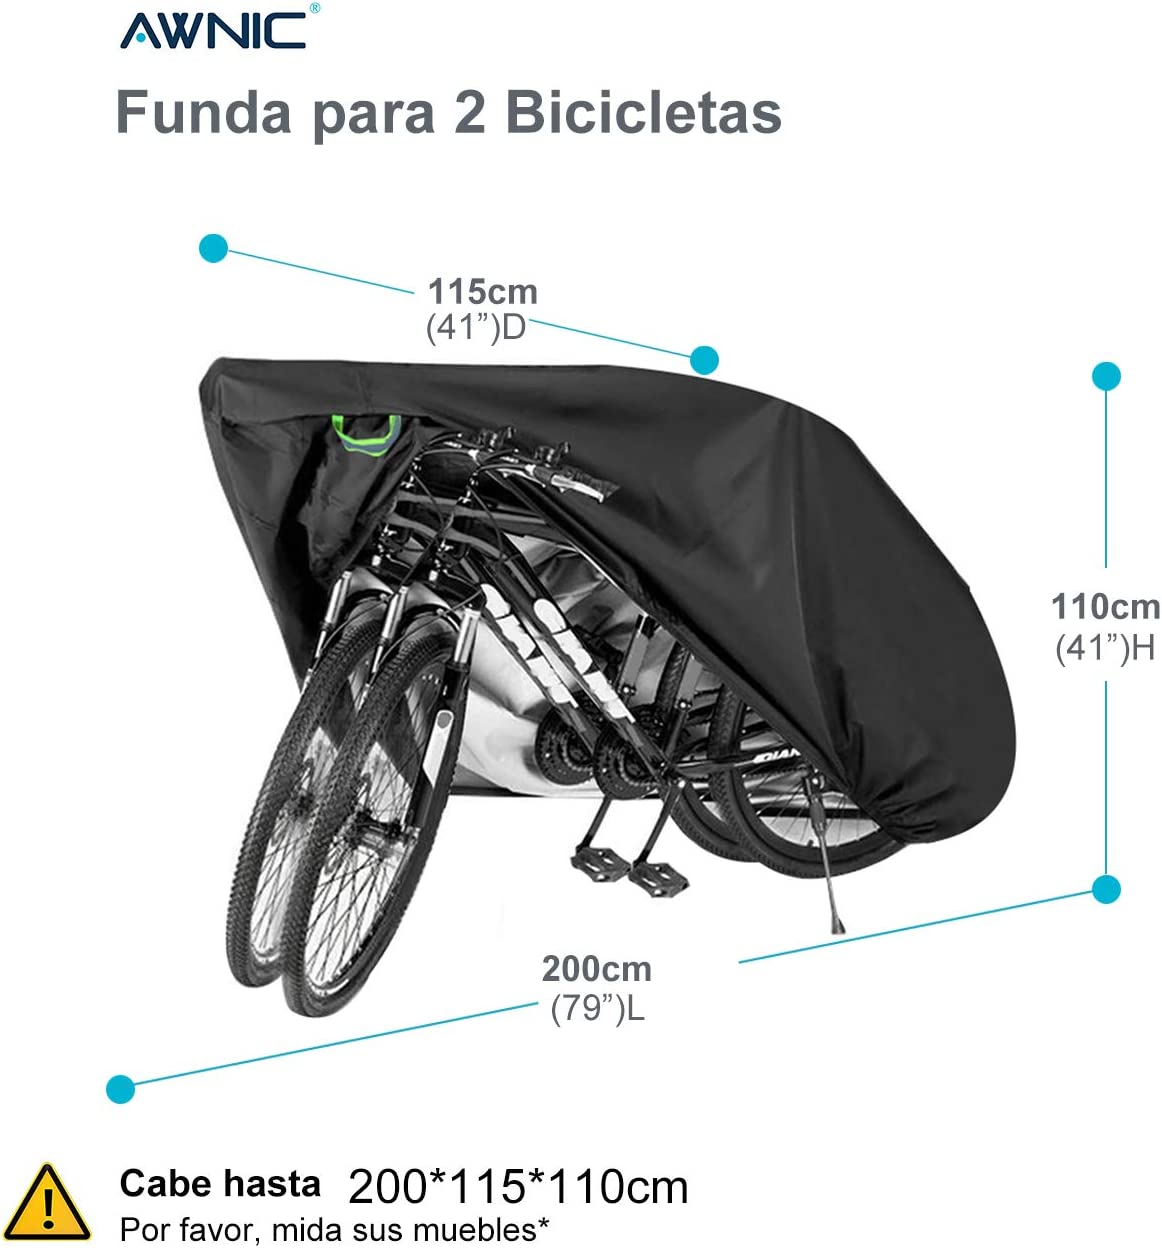 Awnic Funda Bicicleta Impermeable Funda para 2 Bicicletas ...